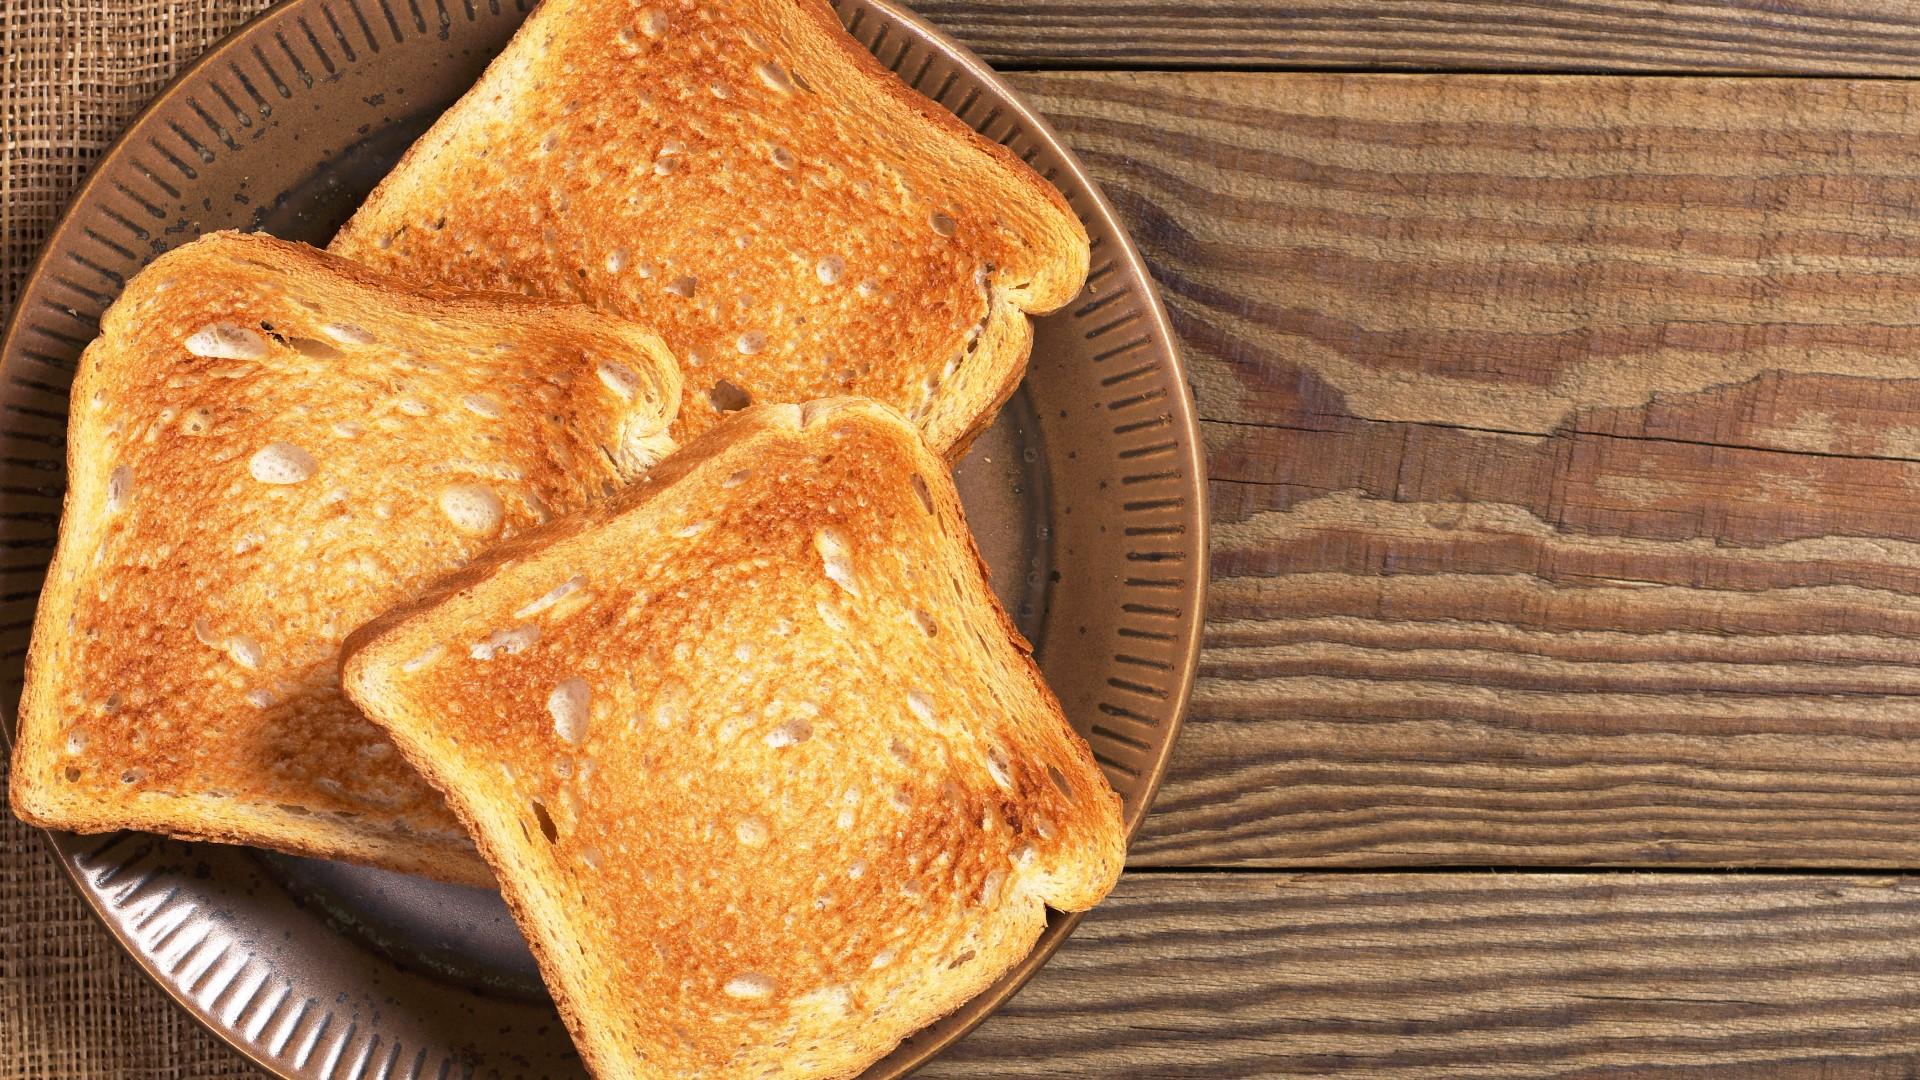 toast club sandwich